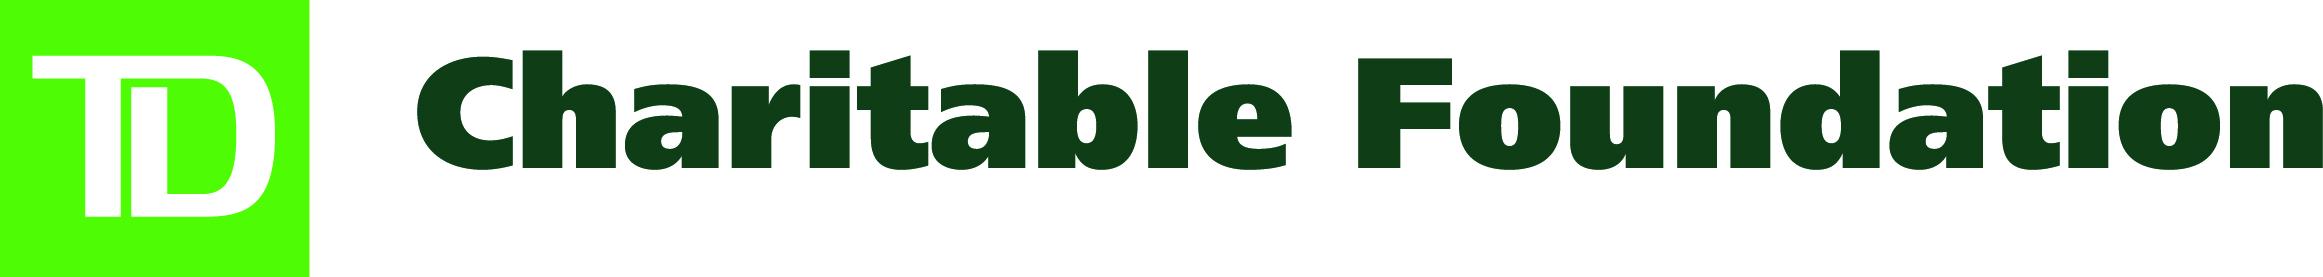 TD Charitable Foundation'